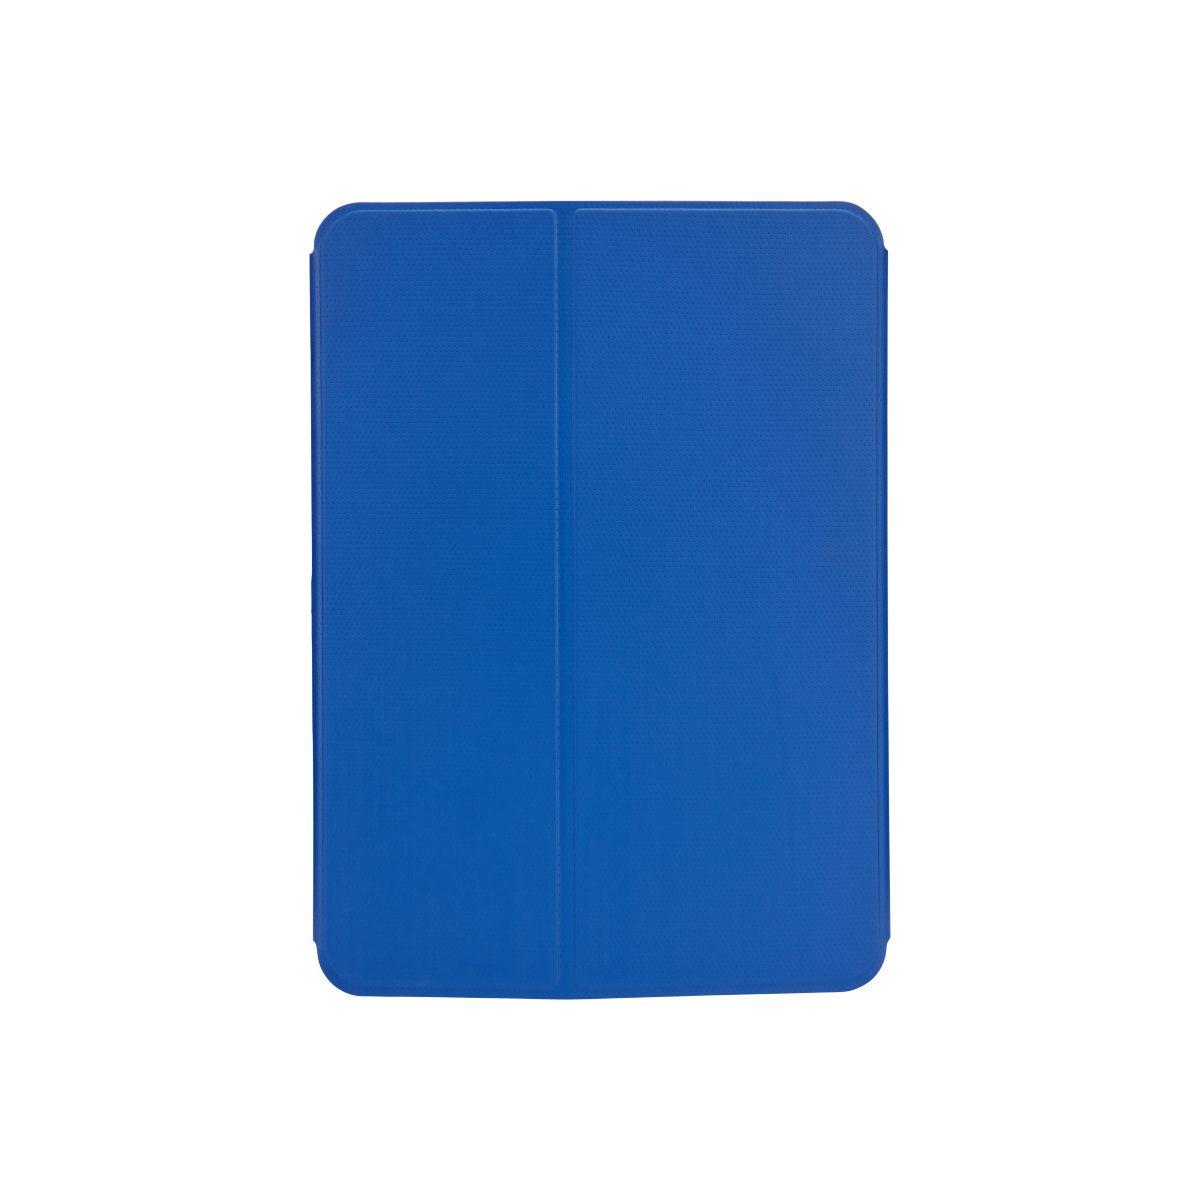 Folio caselogic galaxy tab 4 10'' bleu - 20% de remise immédiate avec le code : multi20 (photo)